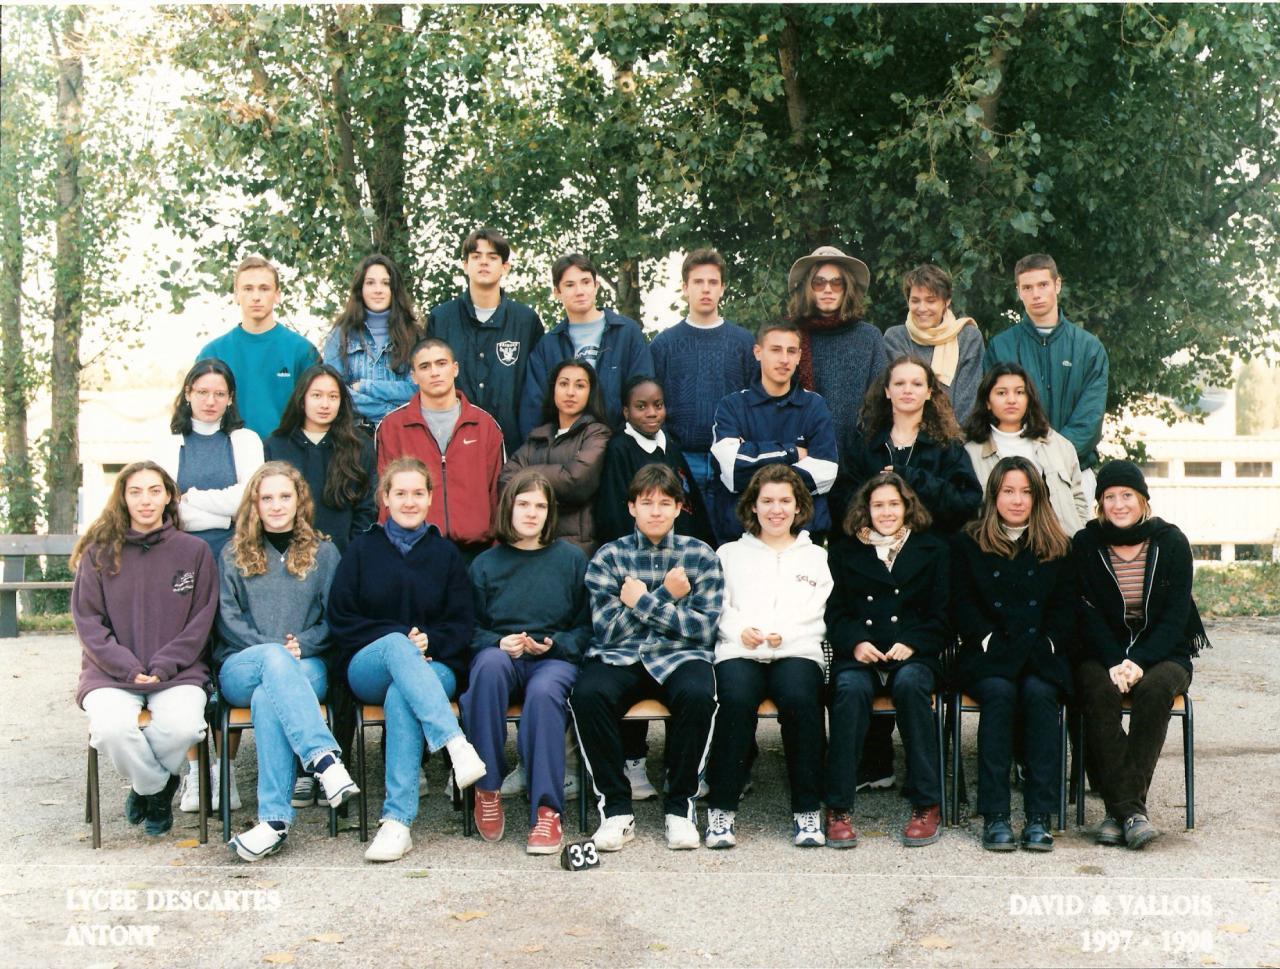 1998 - 1ES3 - DAVID